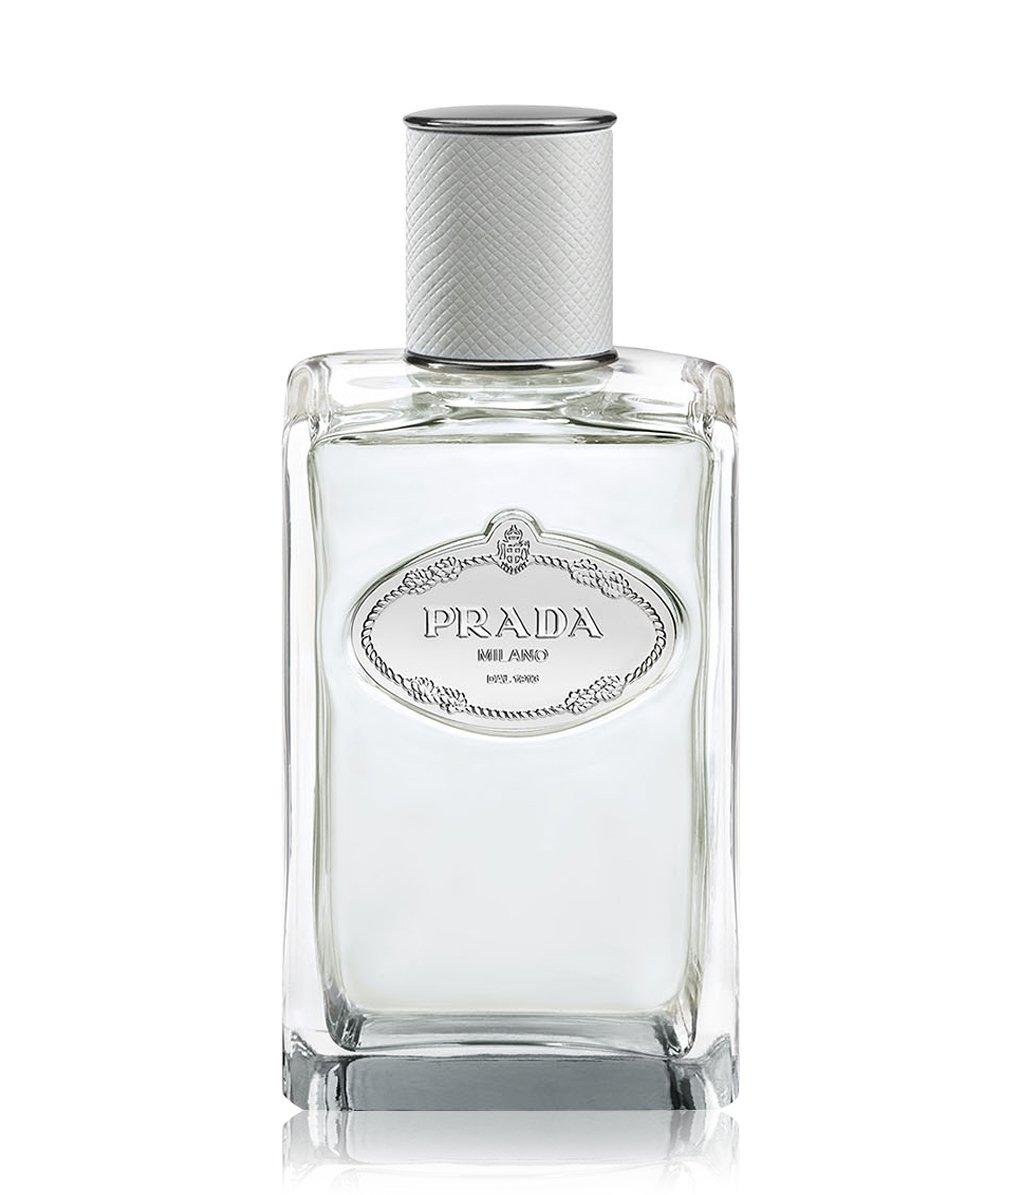 prada infusion d 39 iris c dre eau de parfum bestellen flaconi. Black Bedroom Furniture Sets. Home Design Ideas